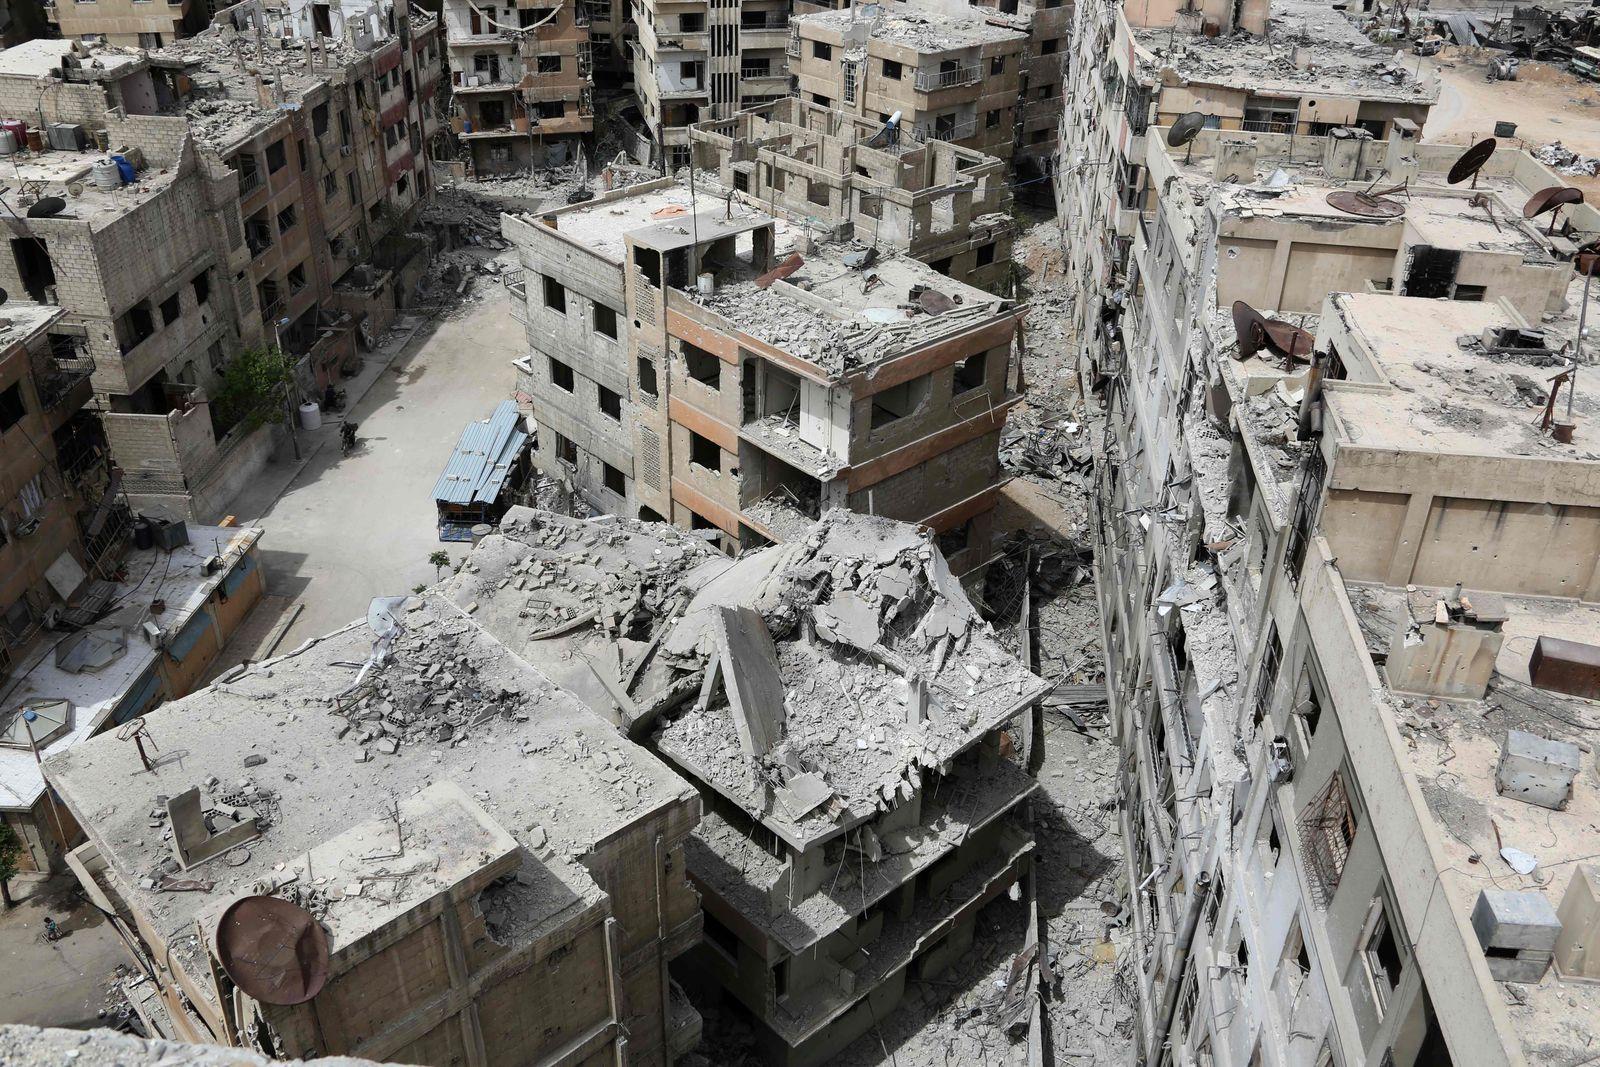 FILES-SYRIA-ARAB-REVOLUTION-ANNIVERSARY